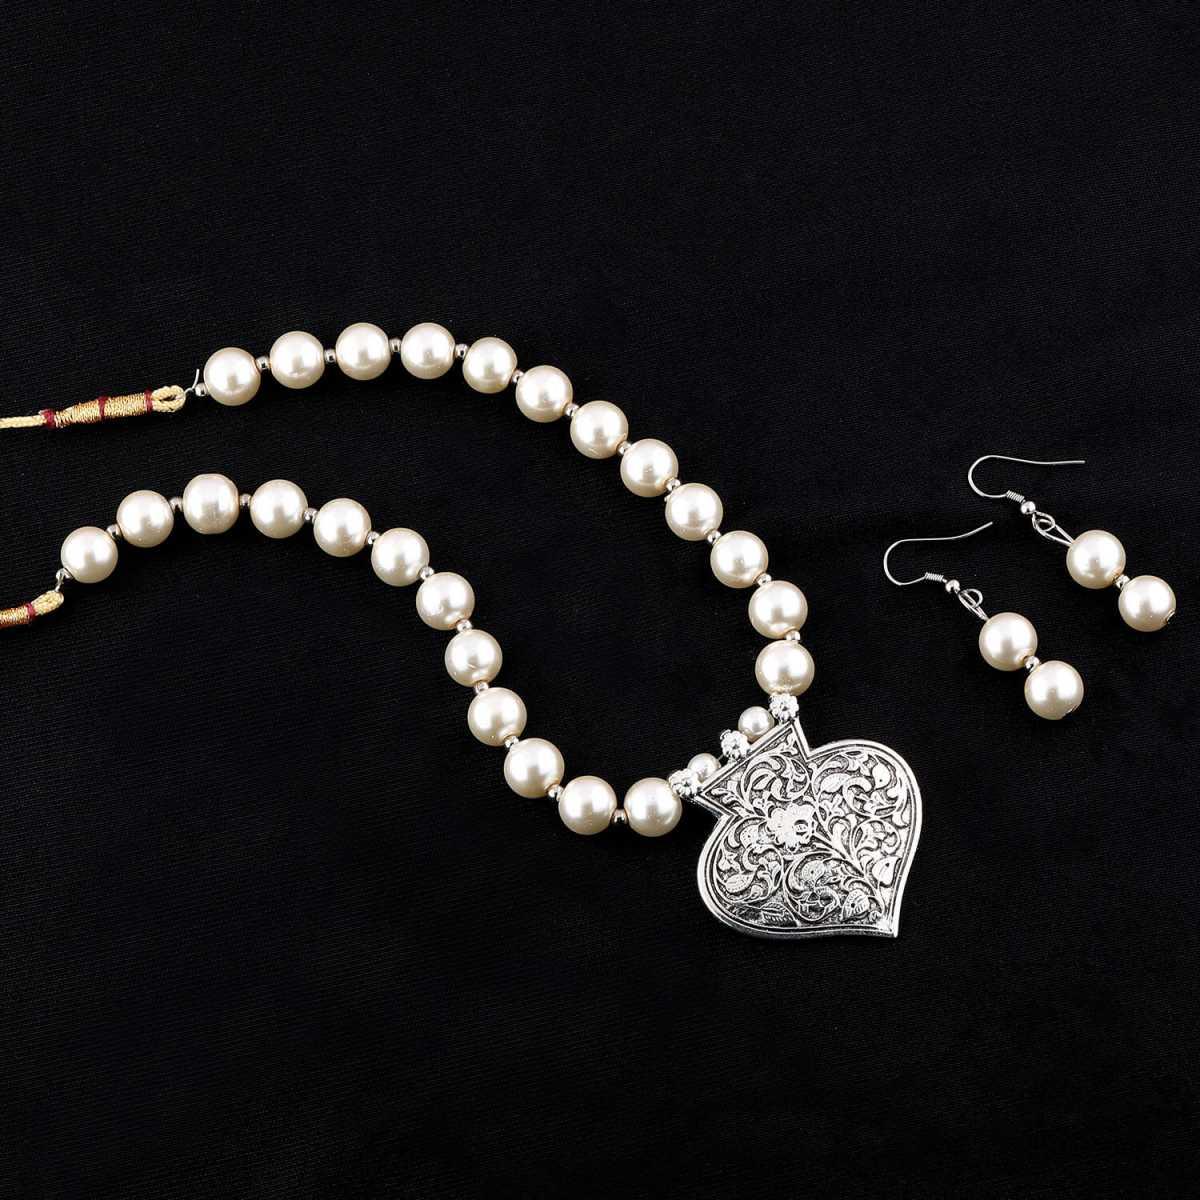 Silver plated Elegant Oxidised Pendant White Pearl Jewellery set for Women